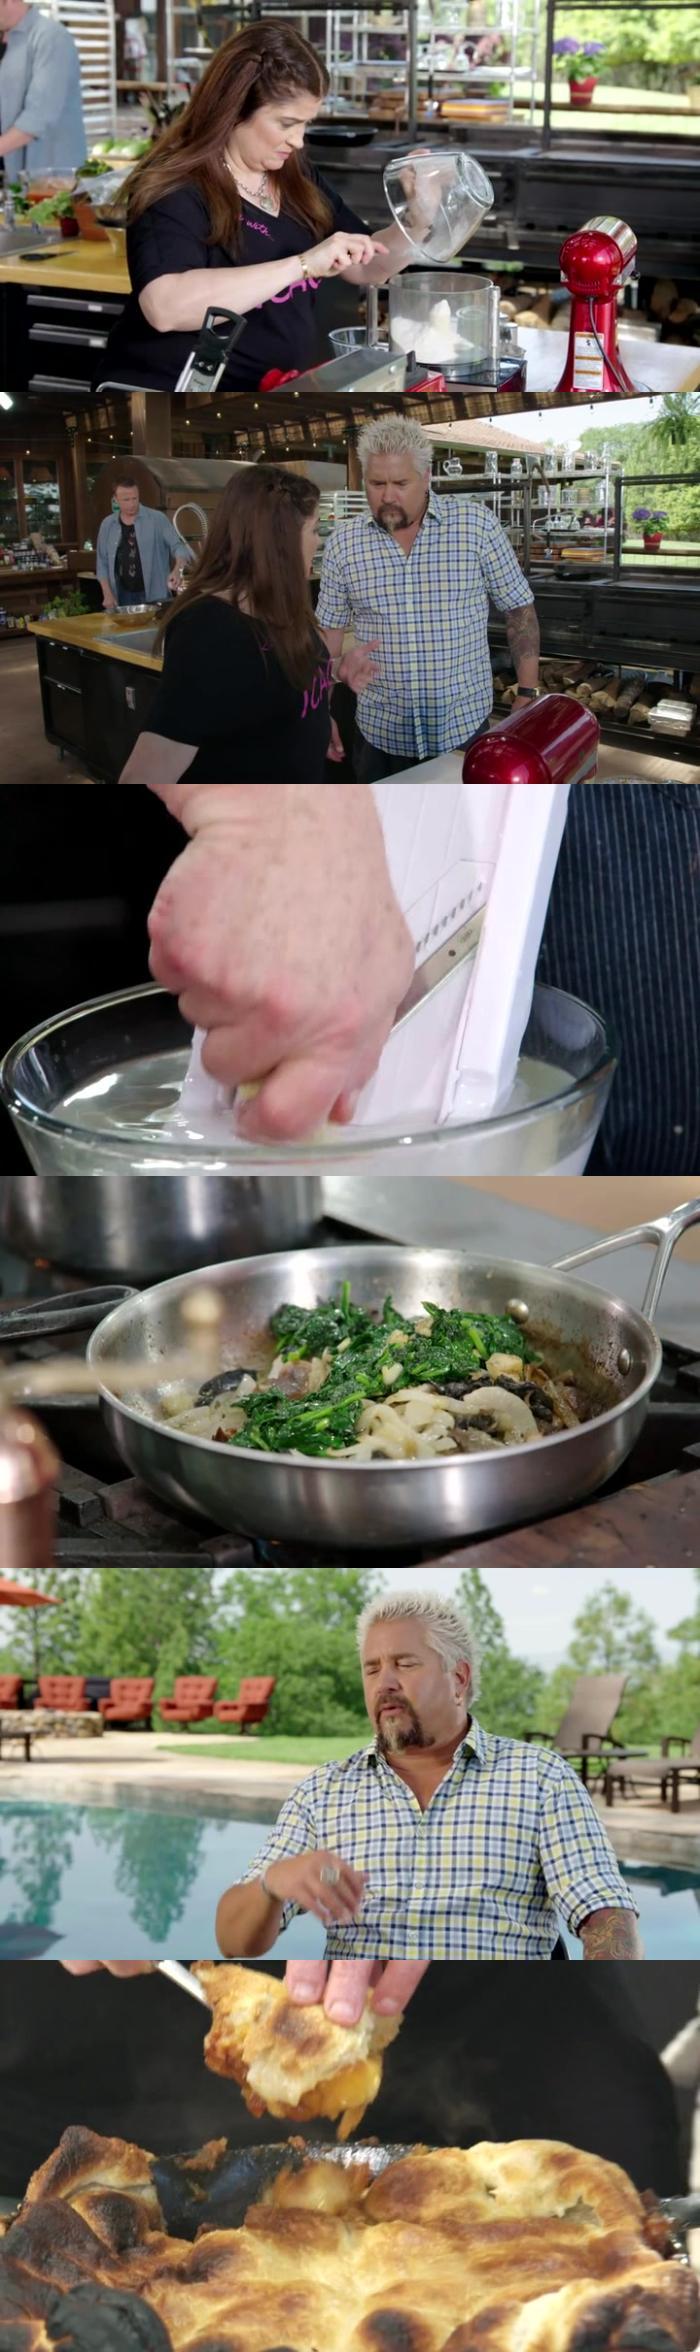 Guys Ranch Kitchen S03E11 Parisian Brunch WEBRip x264 CAFFEiNE